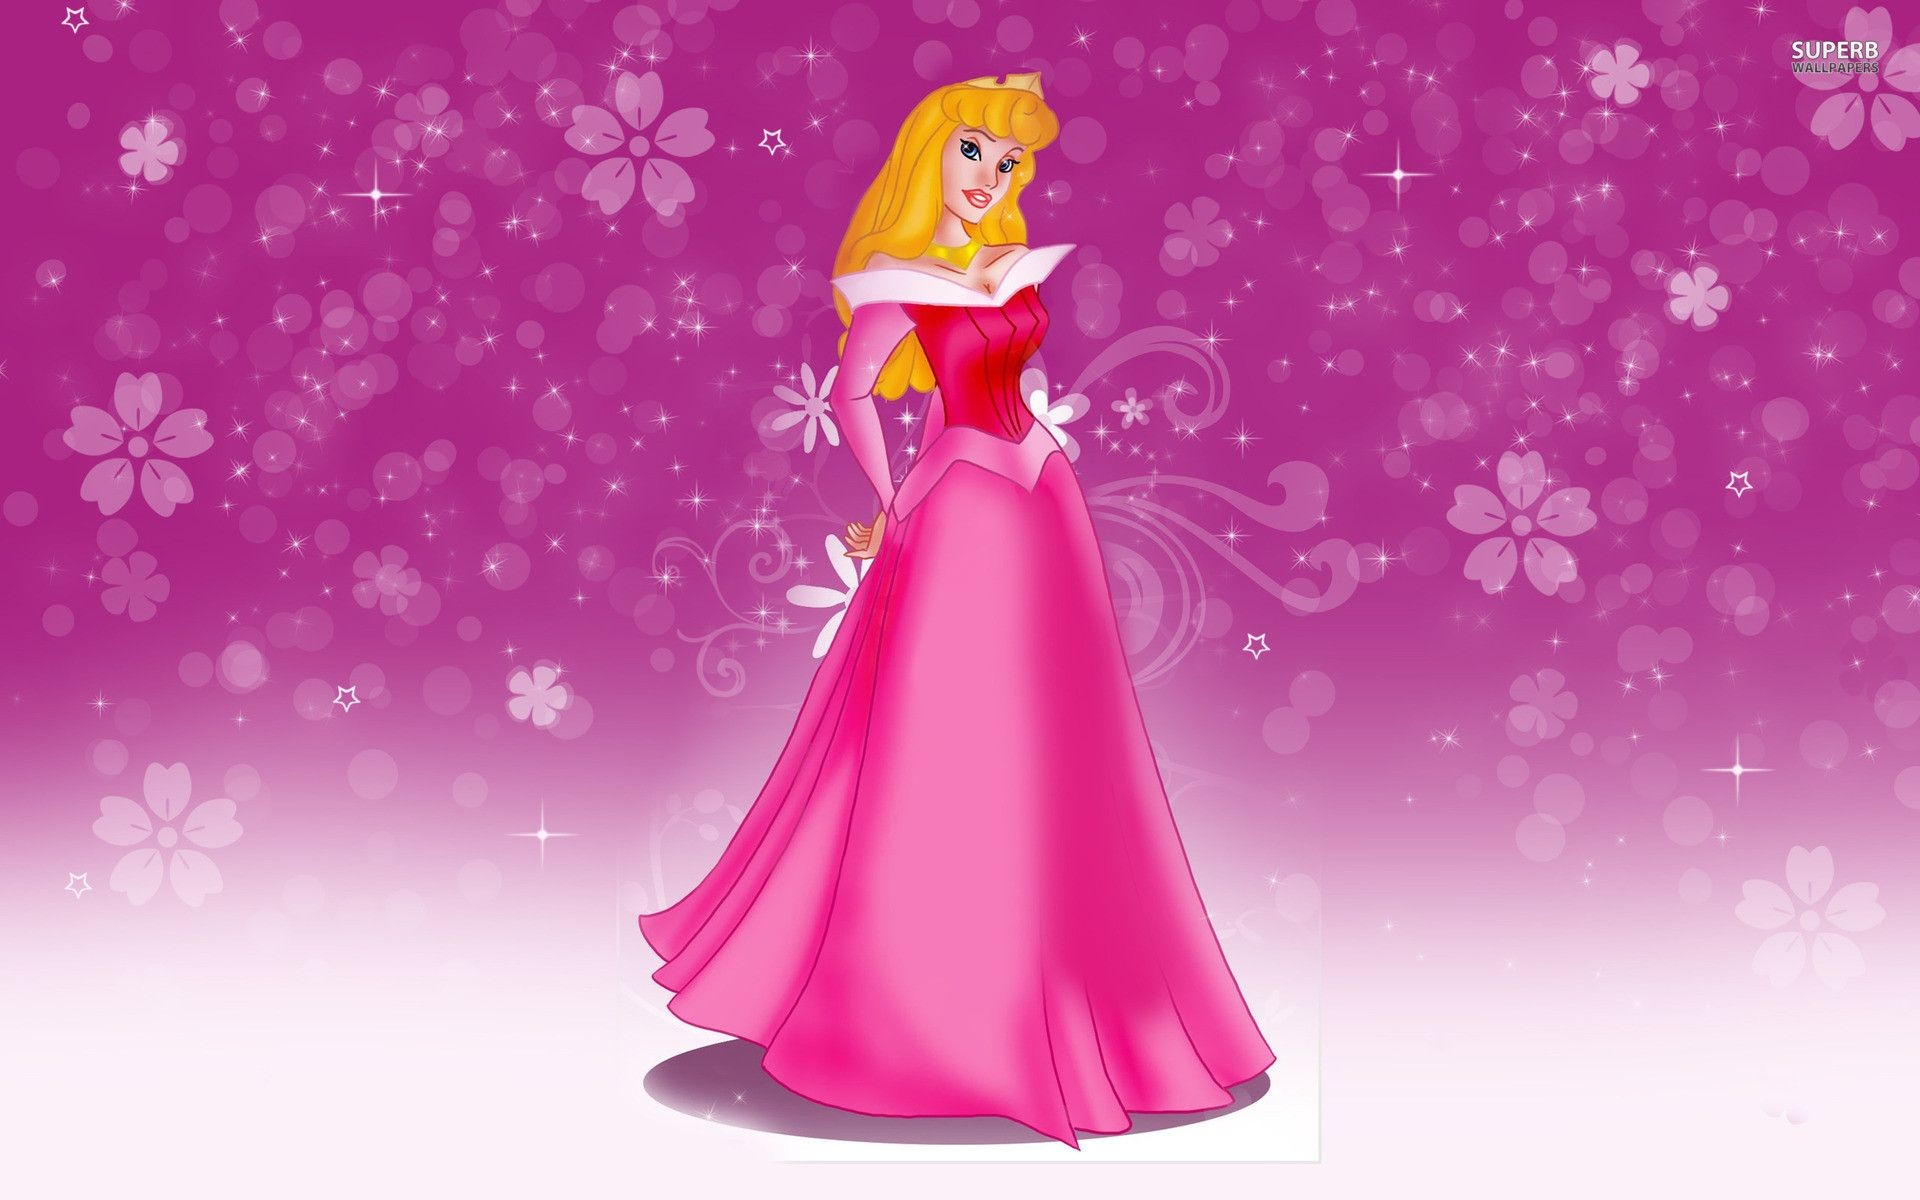 60 Disney Princess Wallpaper Images